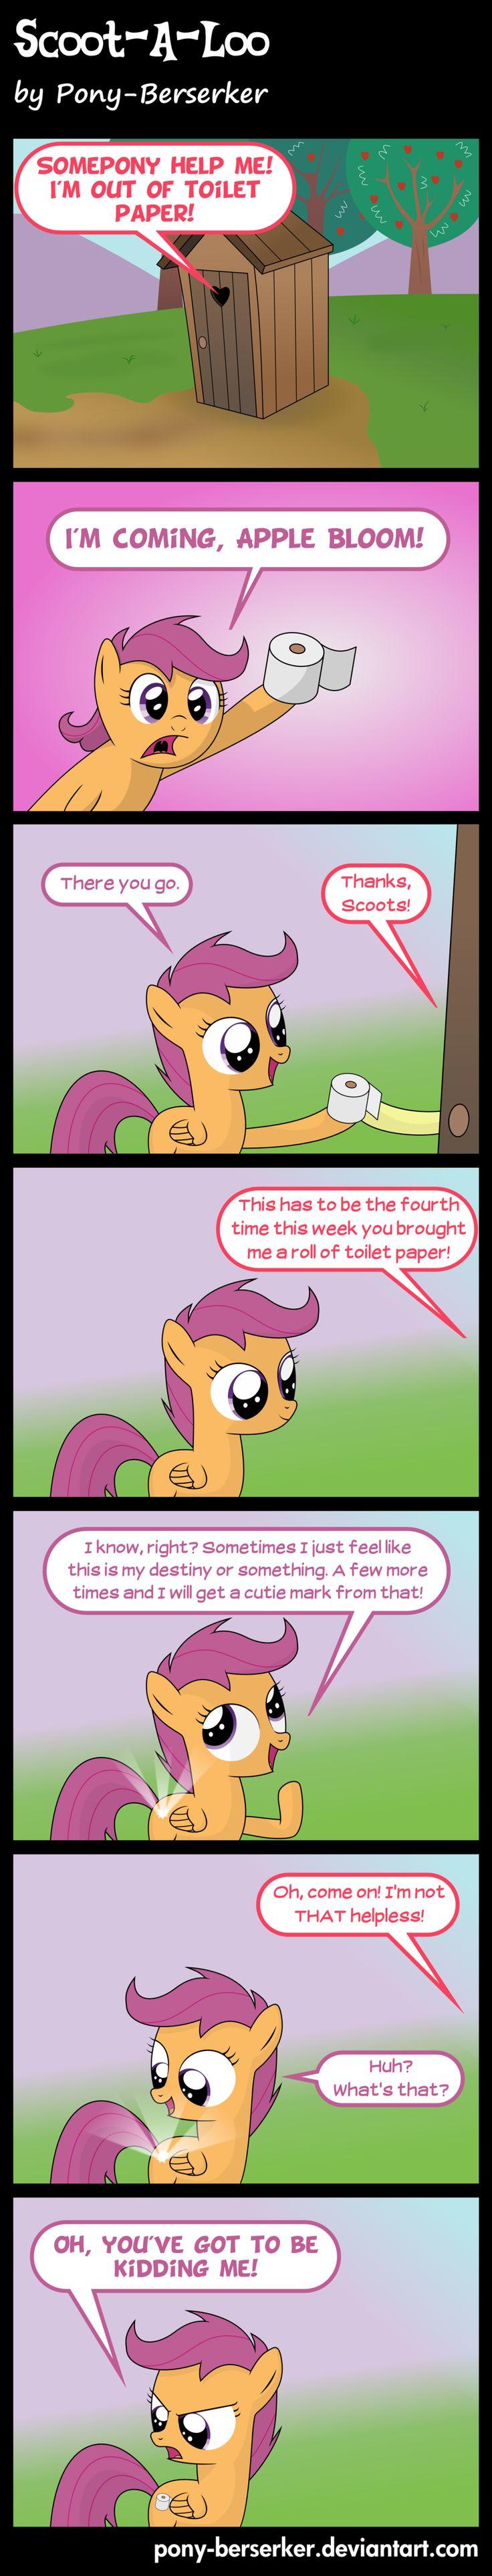 Scoot-A-Loo by *Pony-Berserker on deviantART | MLP FiM My Little Pony Friendship is Magic